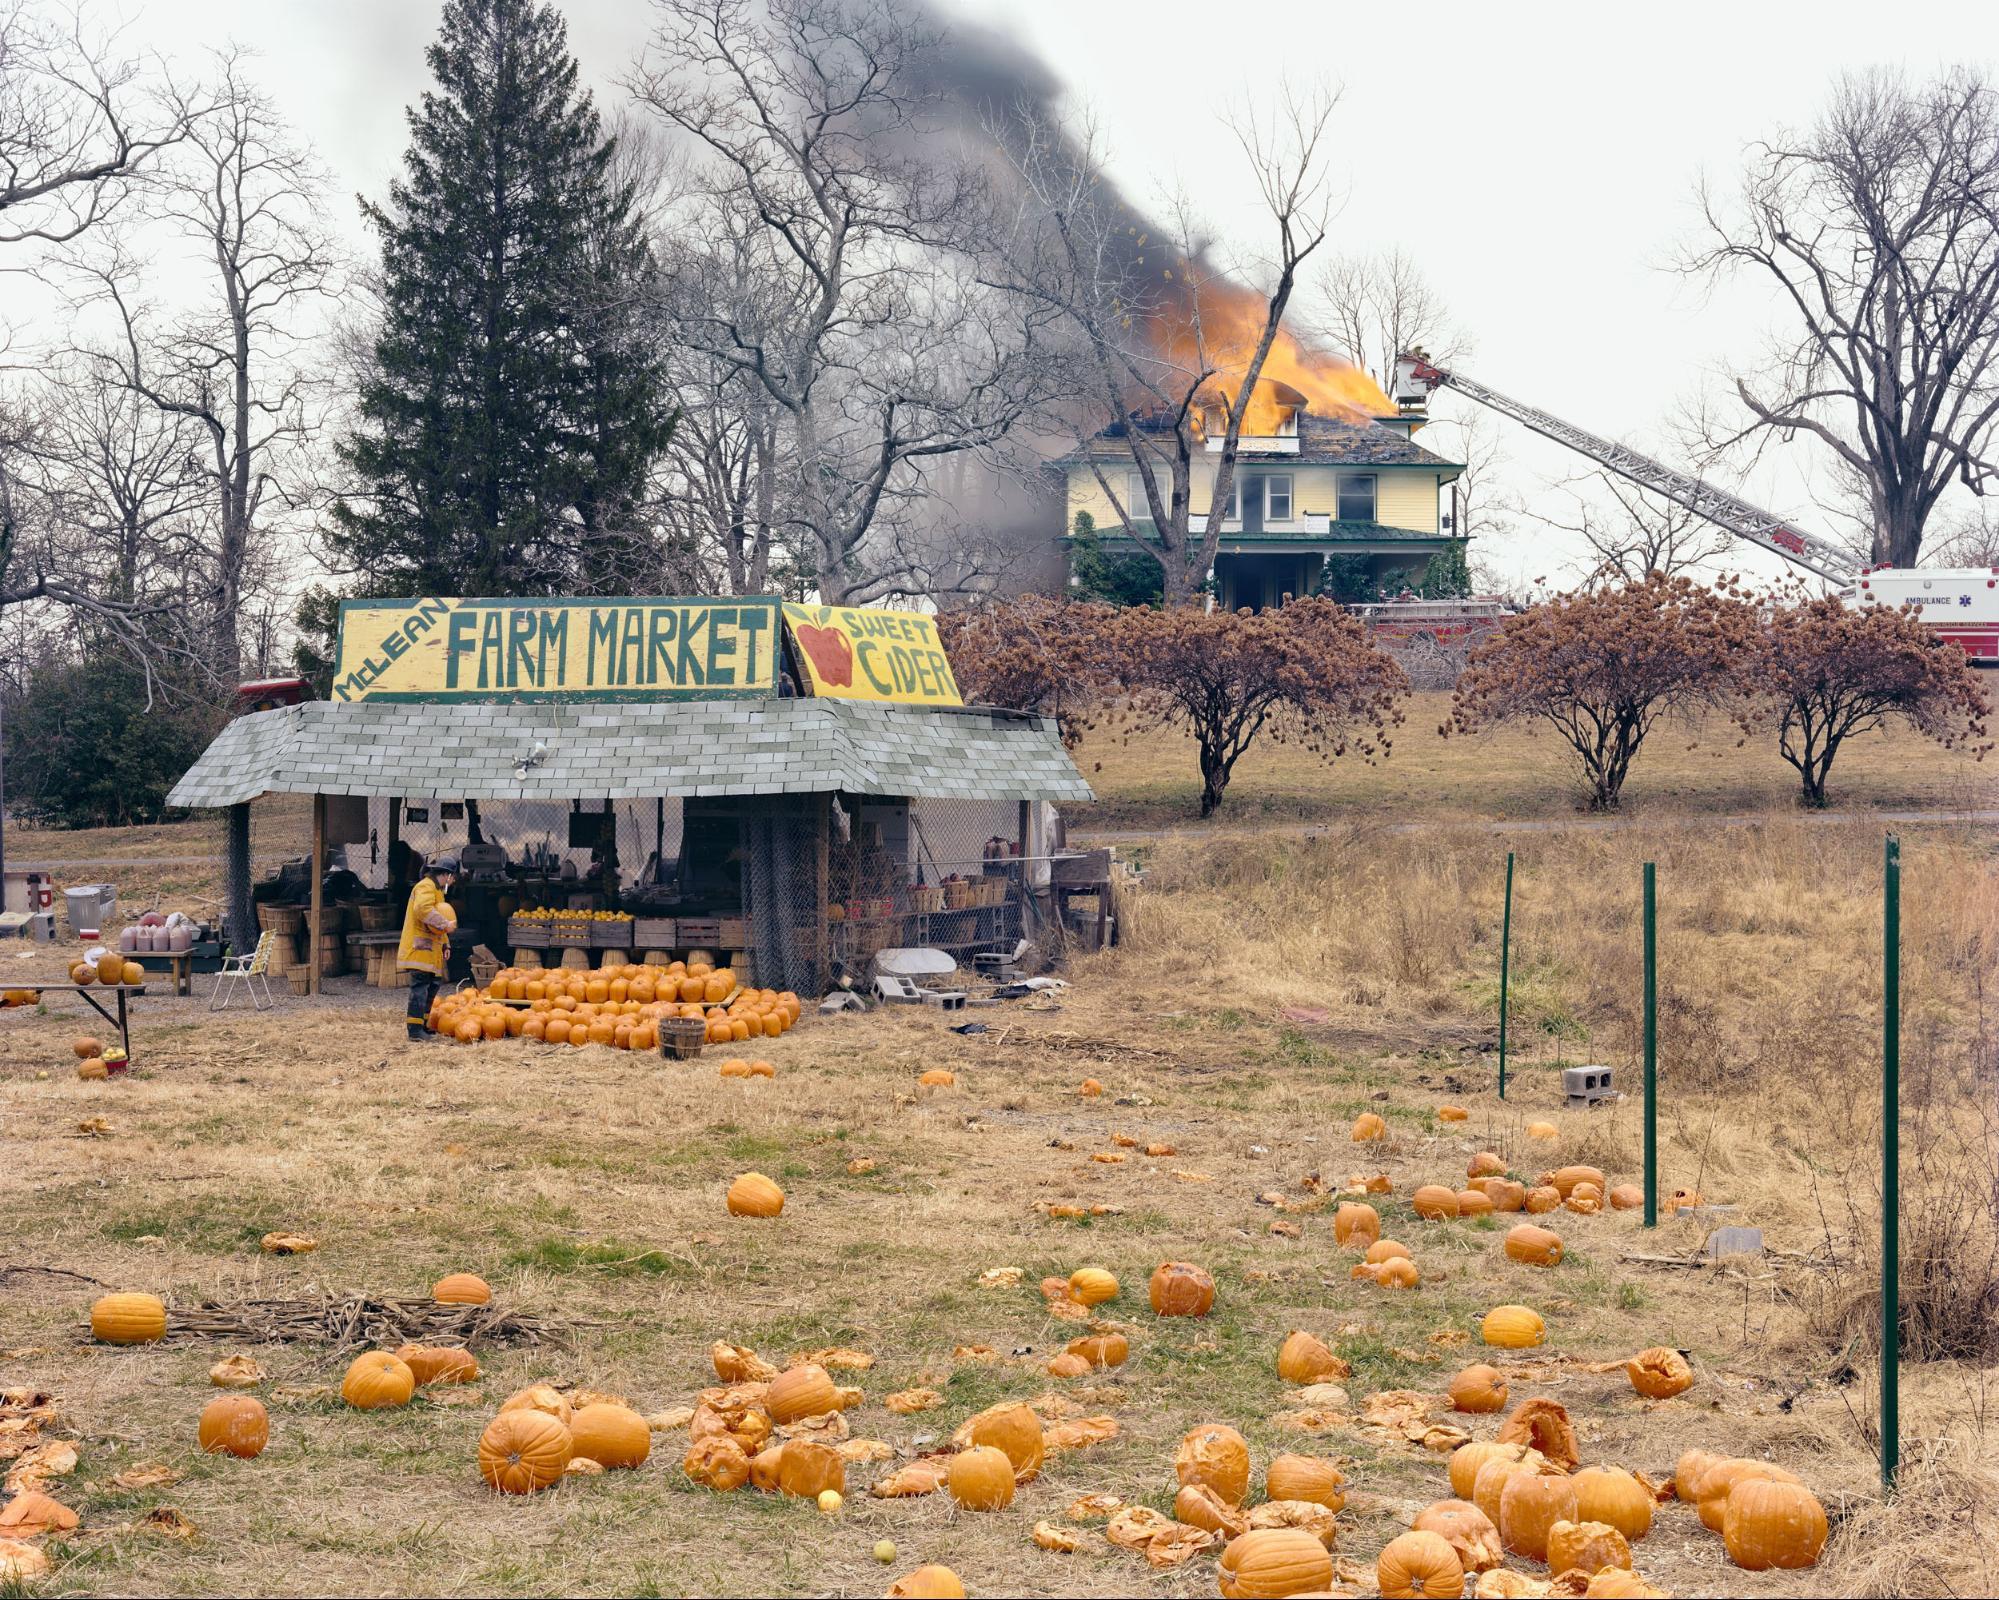 Farbfotografie, Mclean, Virginia, Dezember 1978 - Aus amerikanischen Perspektiven © Joel Sternfield